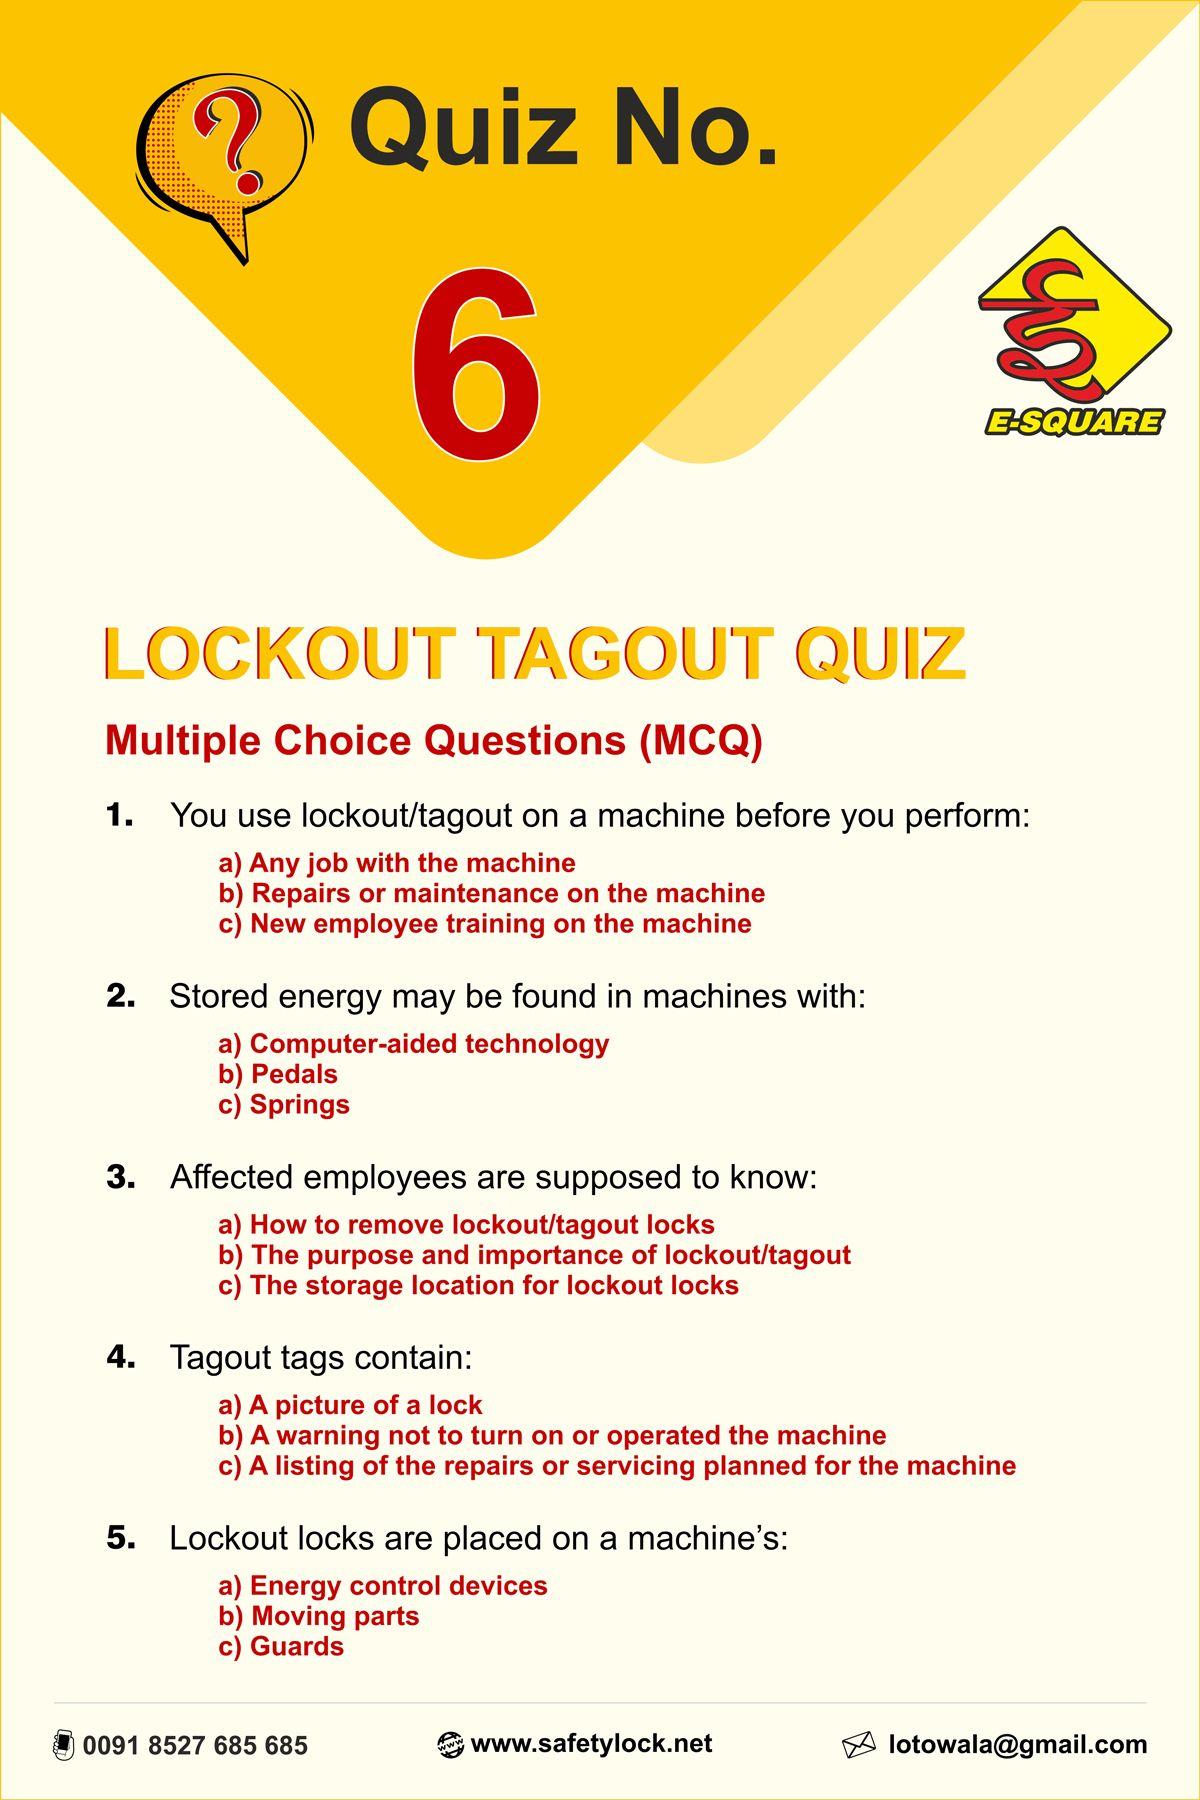 Lockout Tagout Quiz 6 Multiple Choice Questions Lockout Tagout